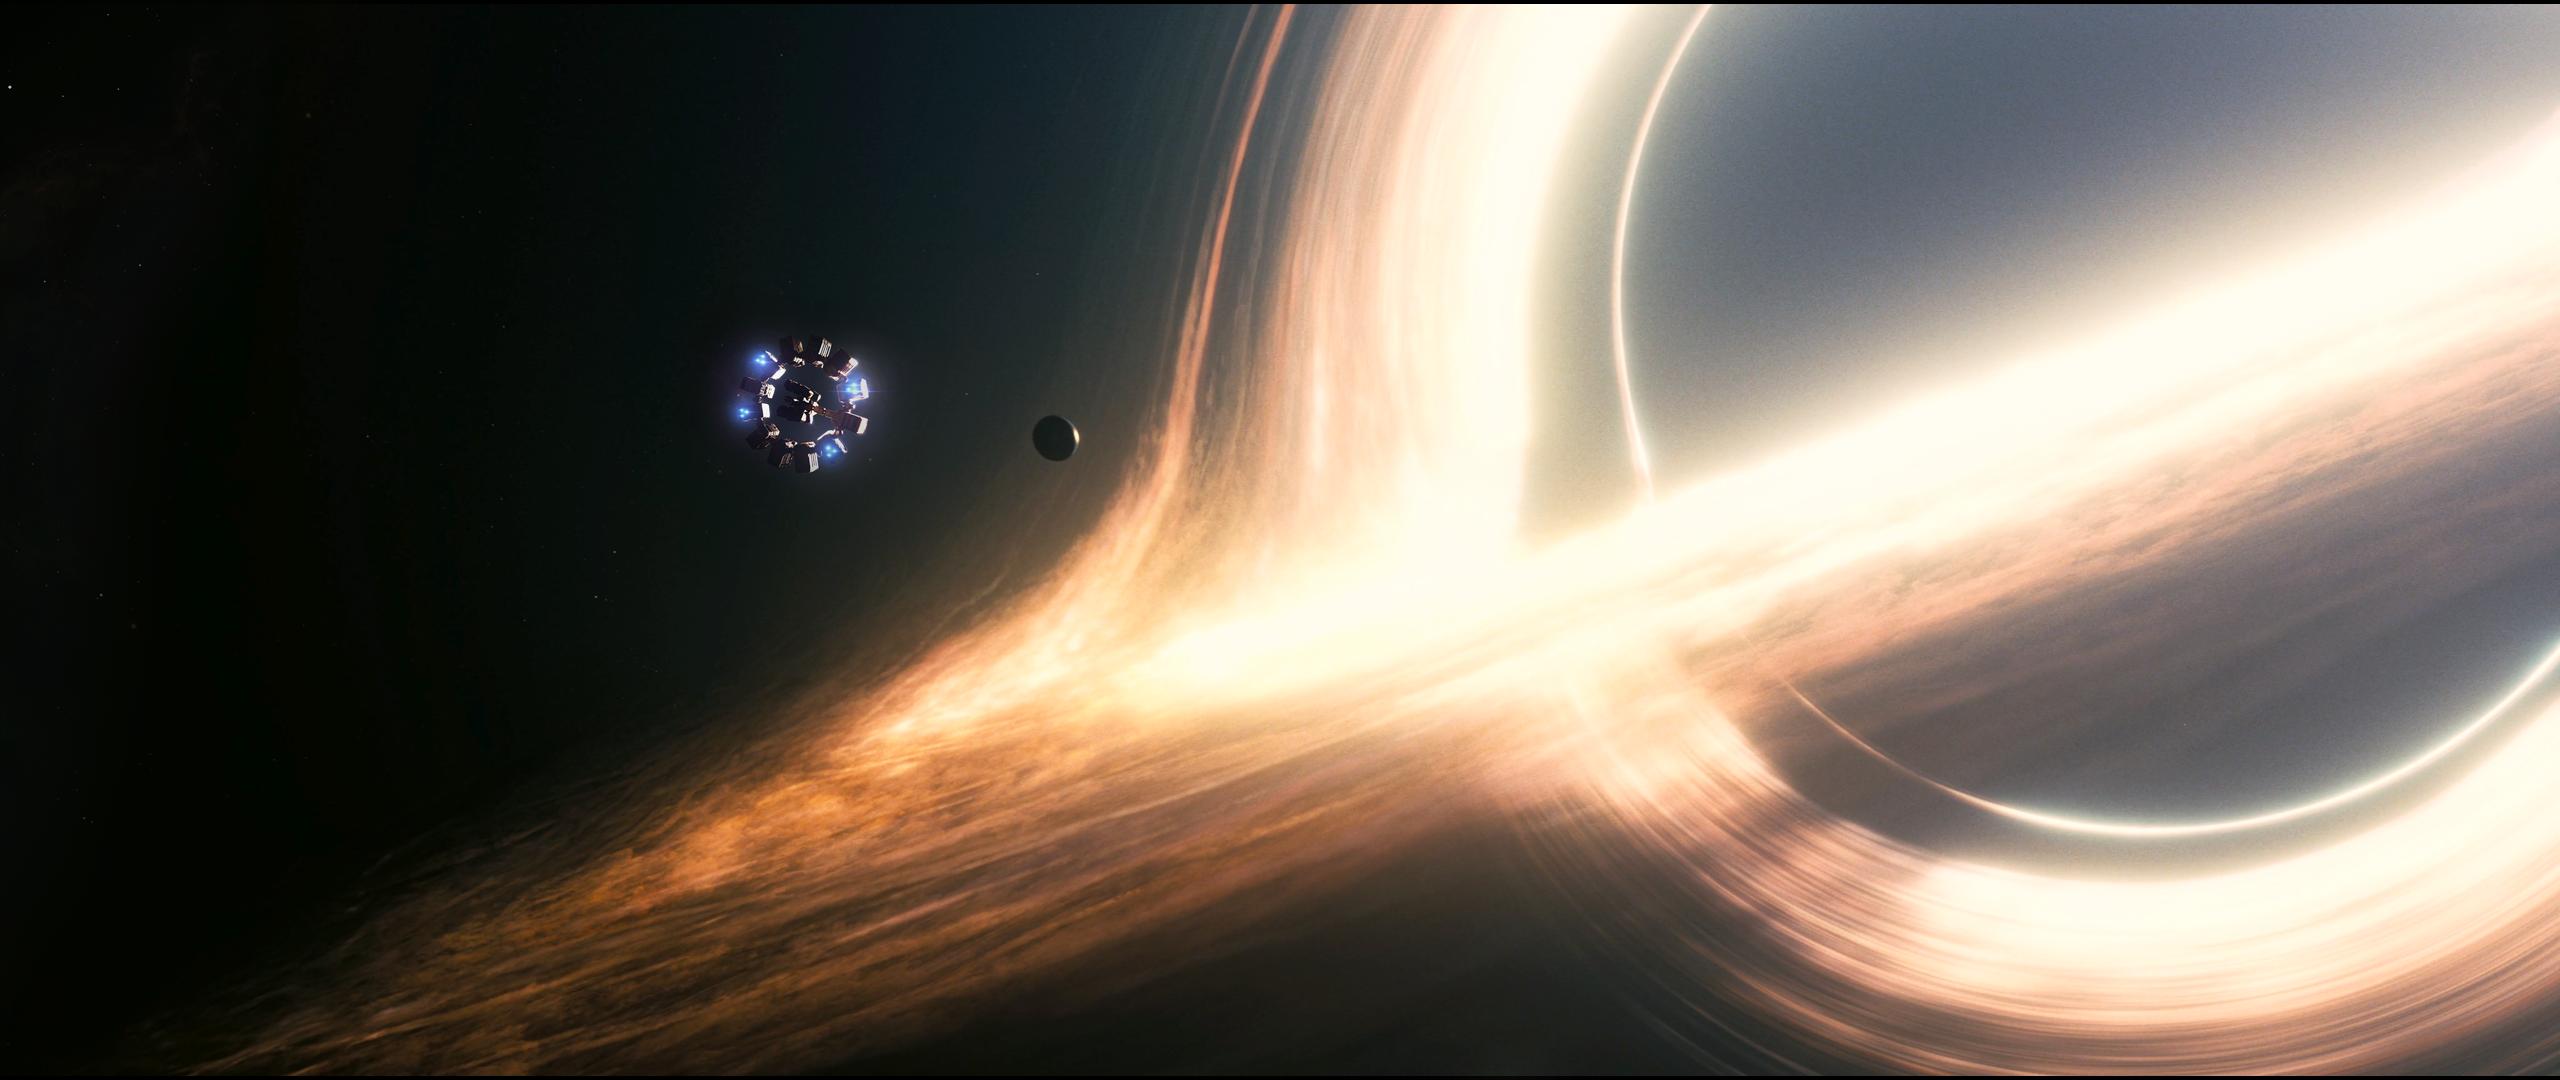 651486 Png 2560 1080 Black Hole Wallpaper Interstellar Black Hole